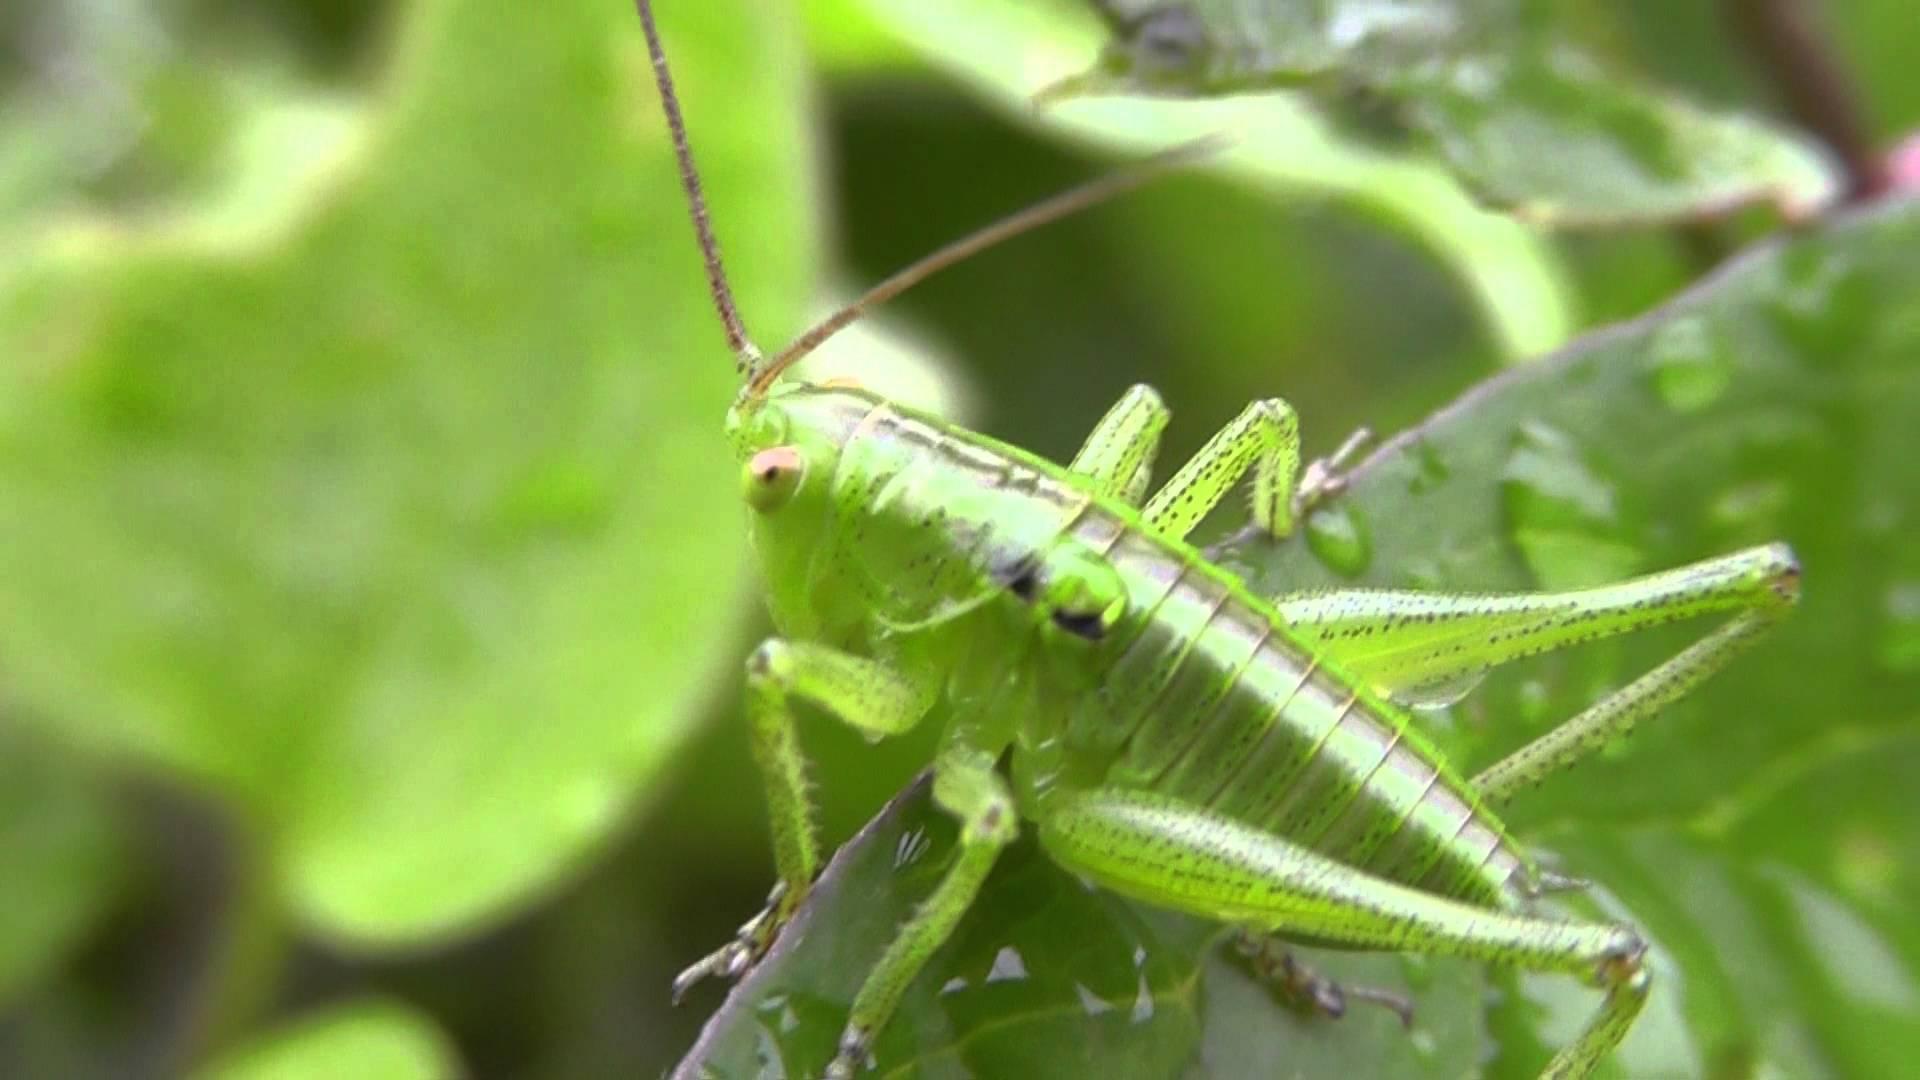 Beautiful Japanese Green Cricket - Order Orthoptera - YouTube